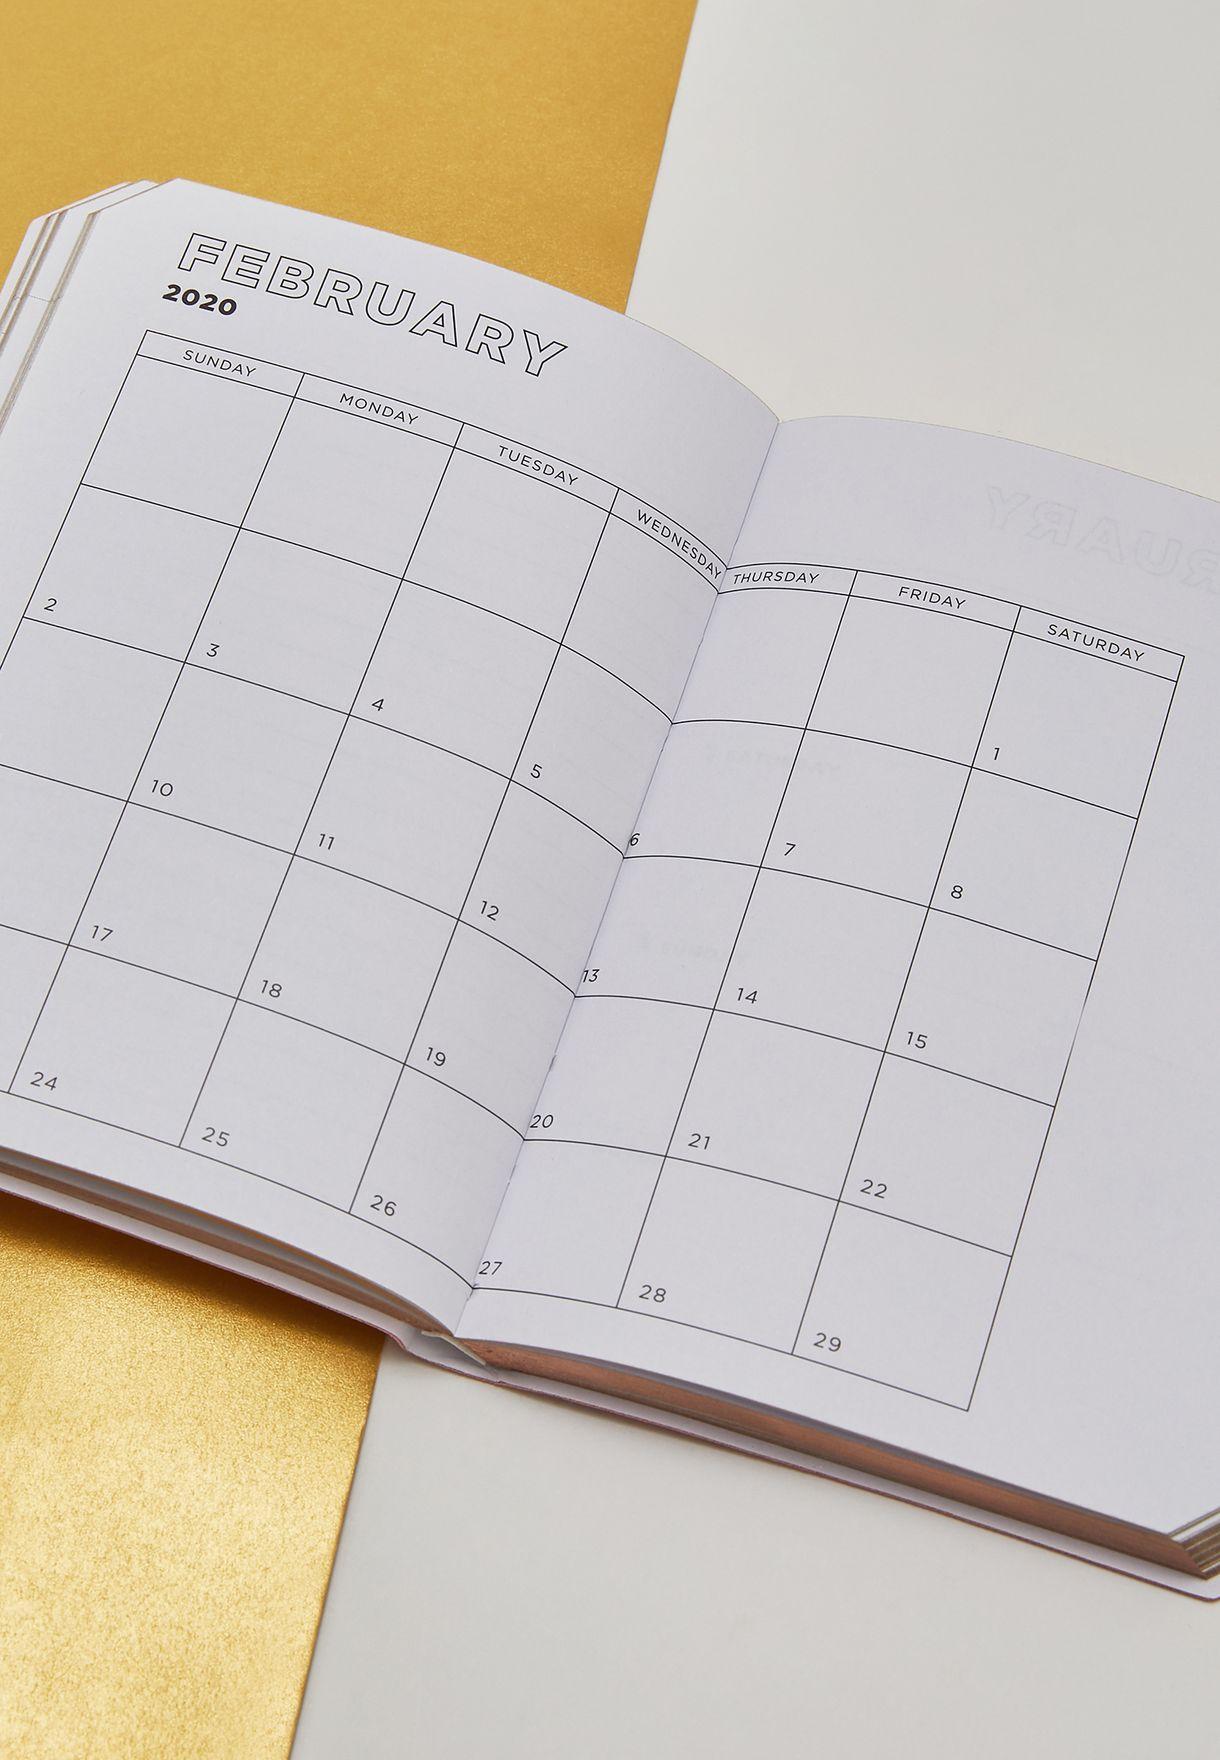 دفتر مذكرات اسبوعي